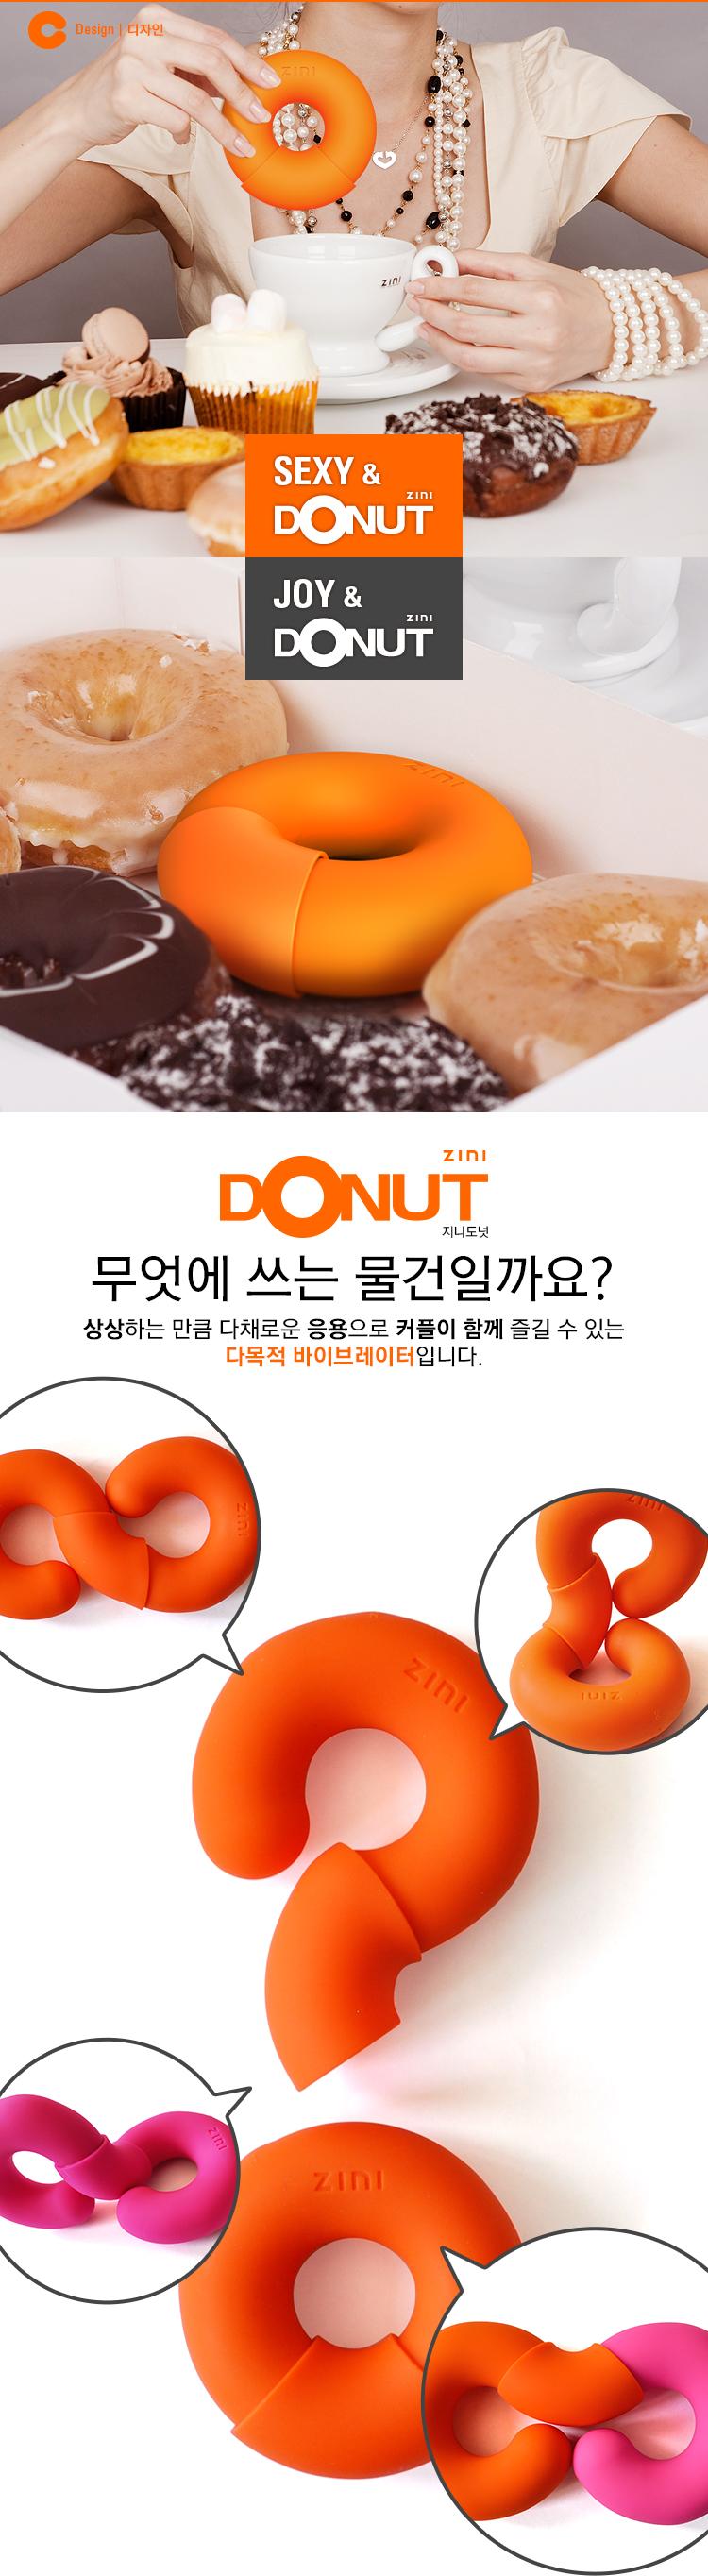 [ZINI] 도넛(DONUT)